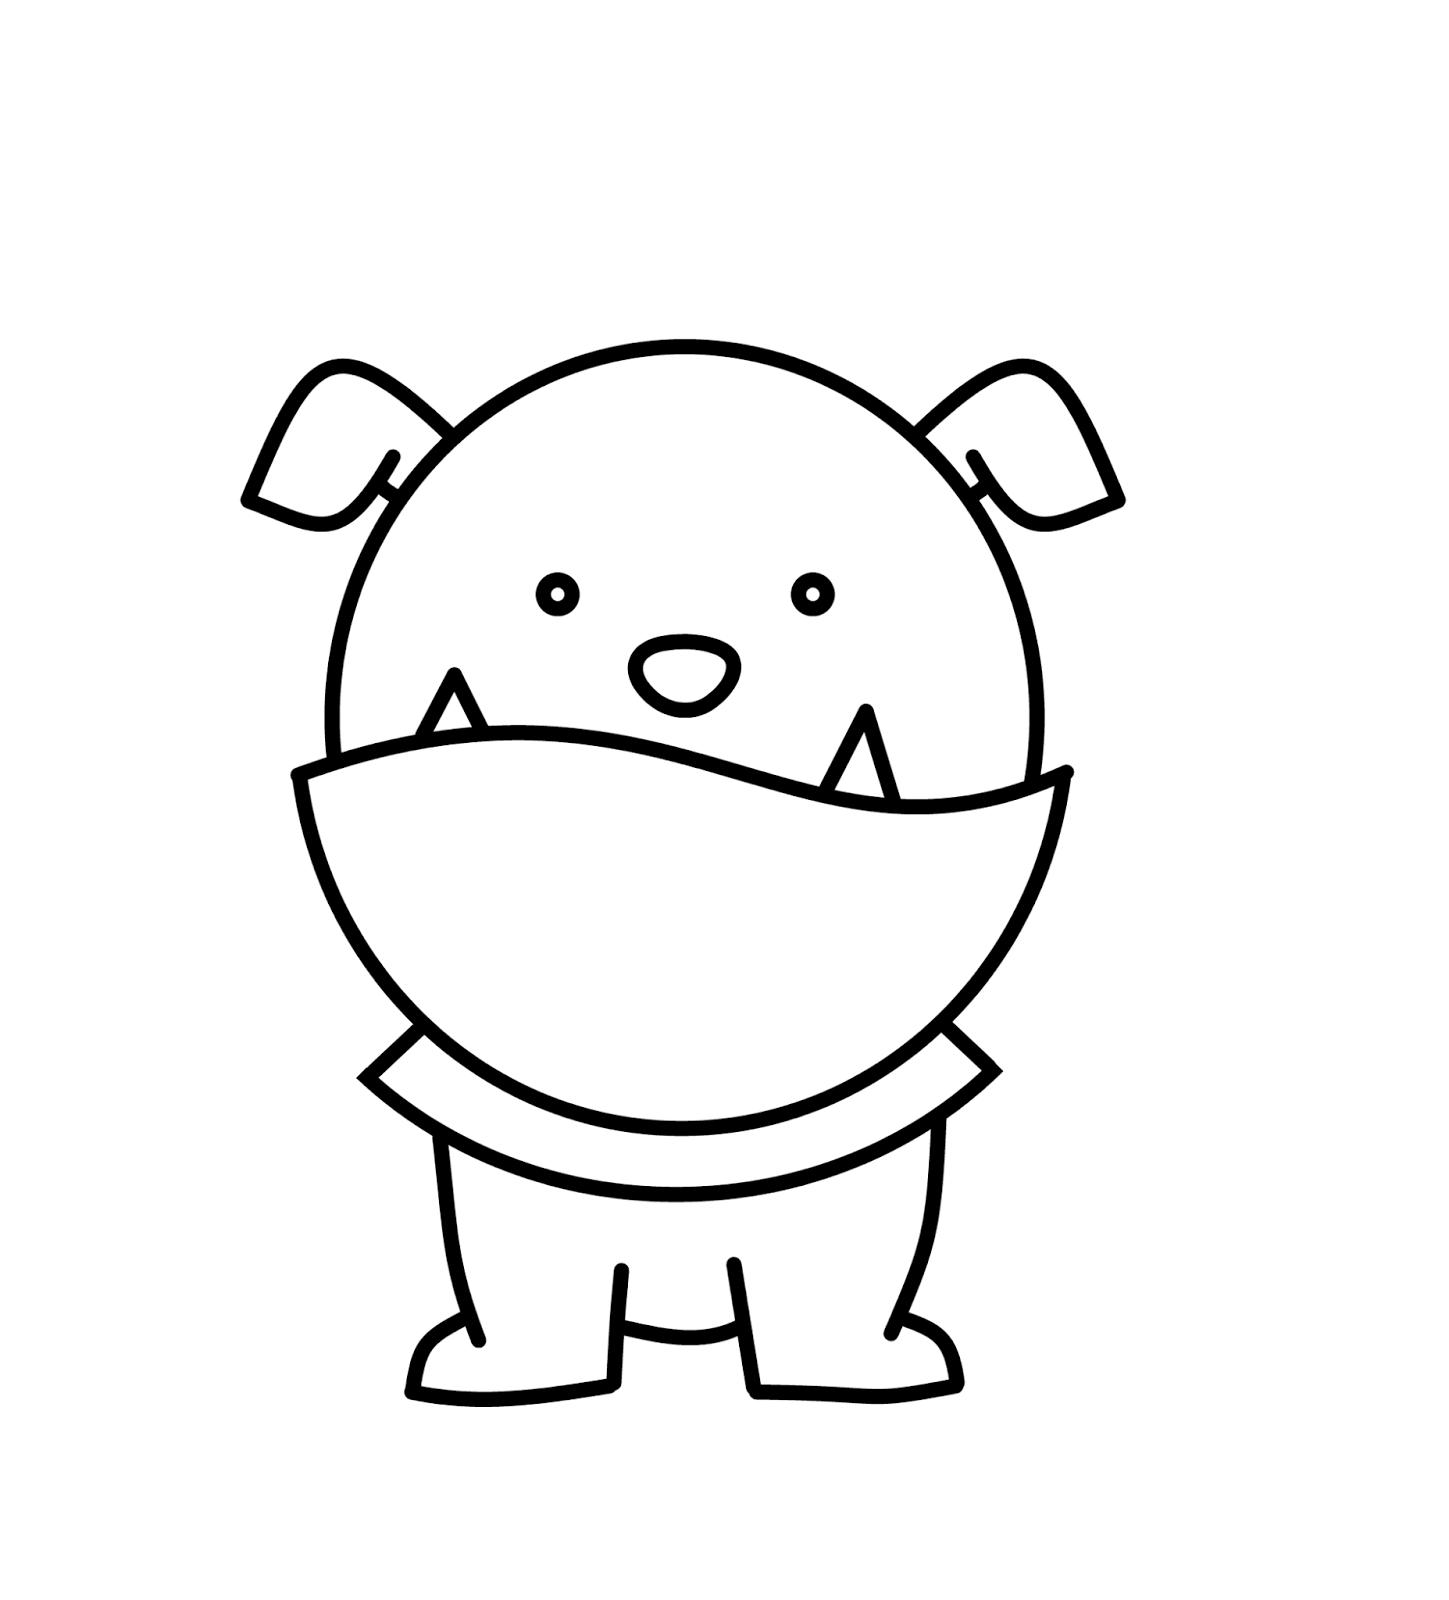 How To Draw Cartoons: English Bulldog